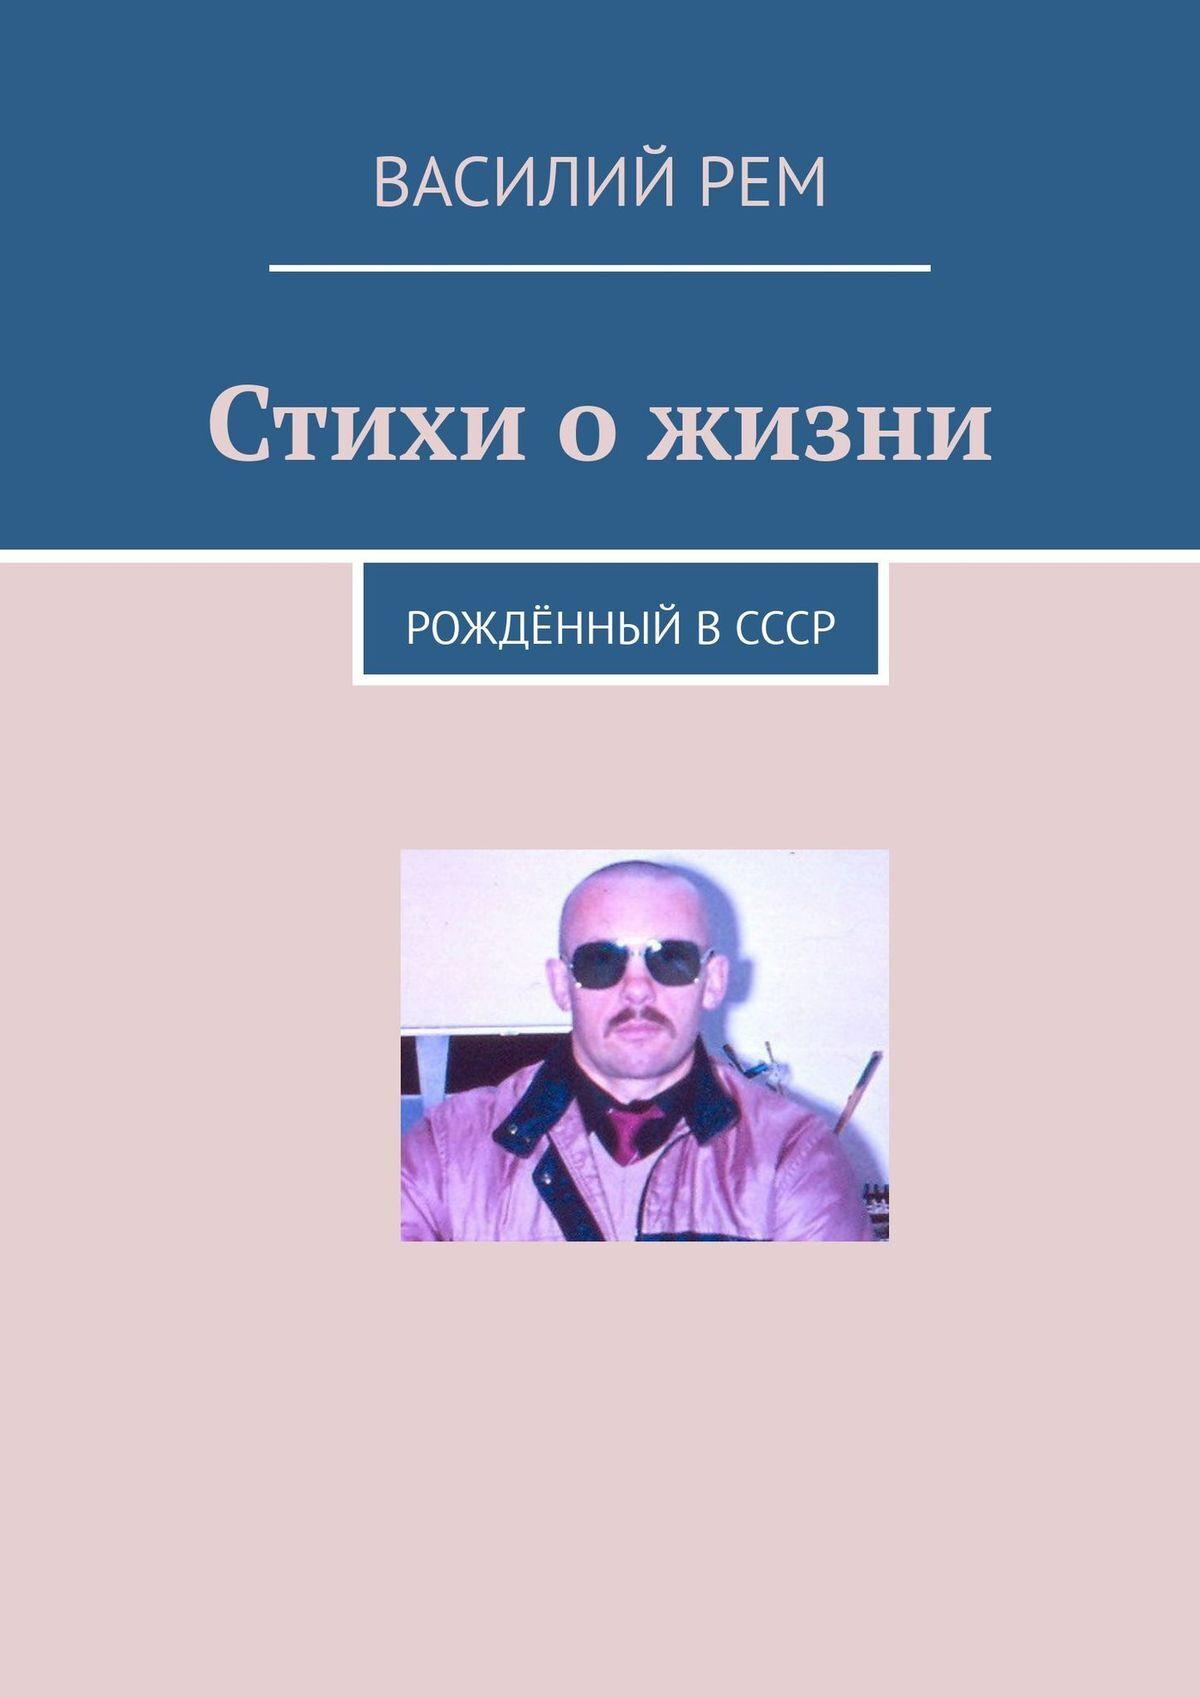 Василий Рем Стихи ожизни. Рождённый вСССР василий рем стихи длявсех рожденный вссср